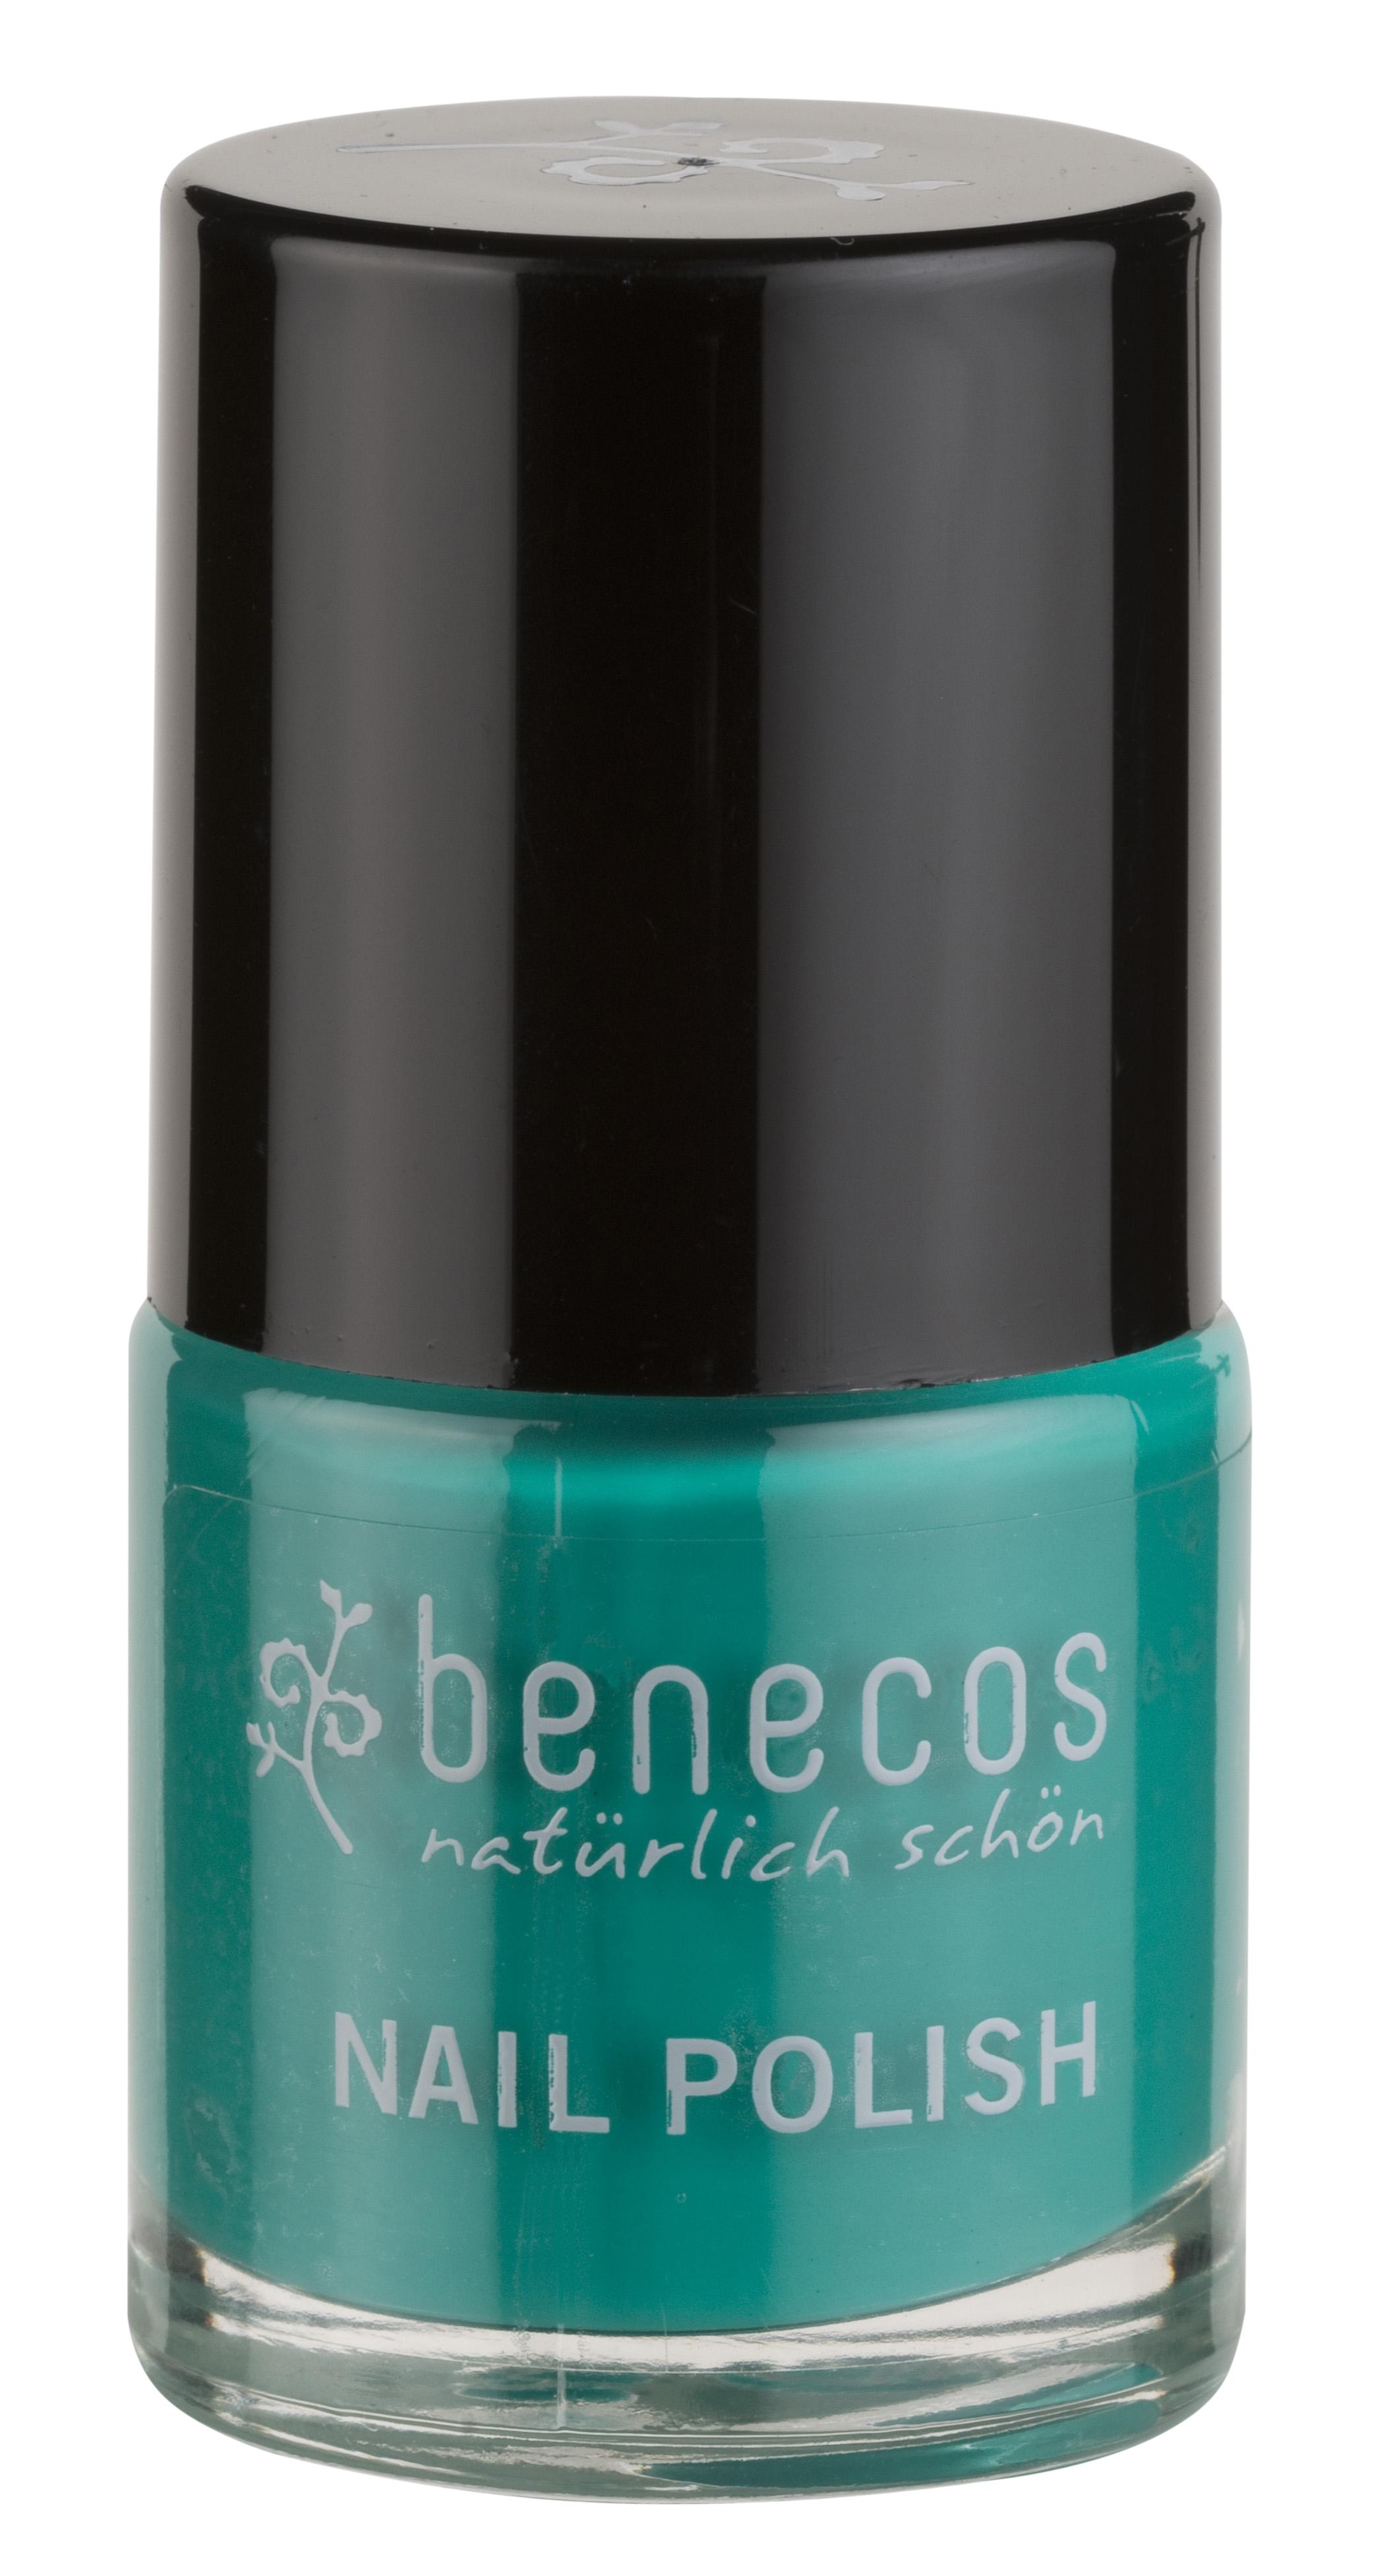 Natural Beauty Happy Nails Benecos Nail Polish Green Beauty Amp Lifestyle